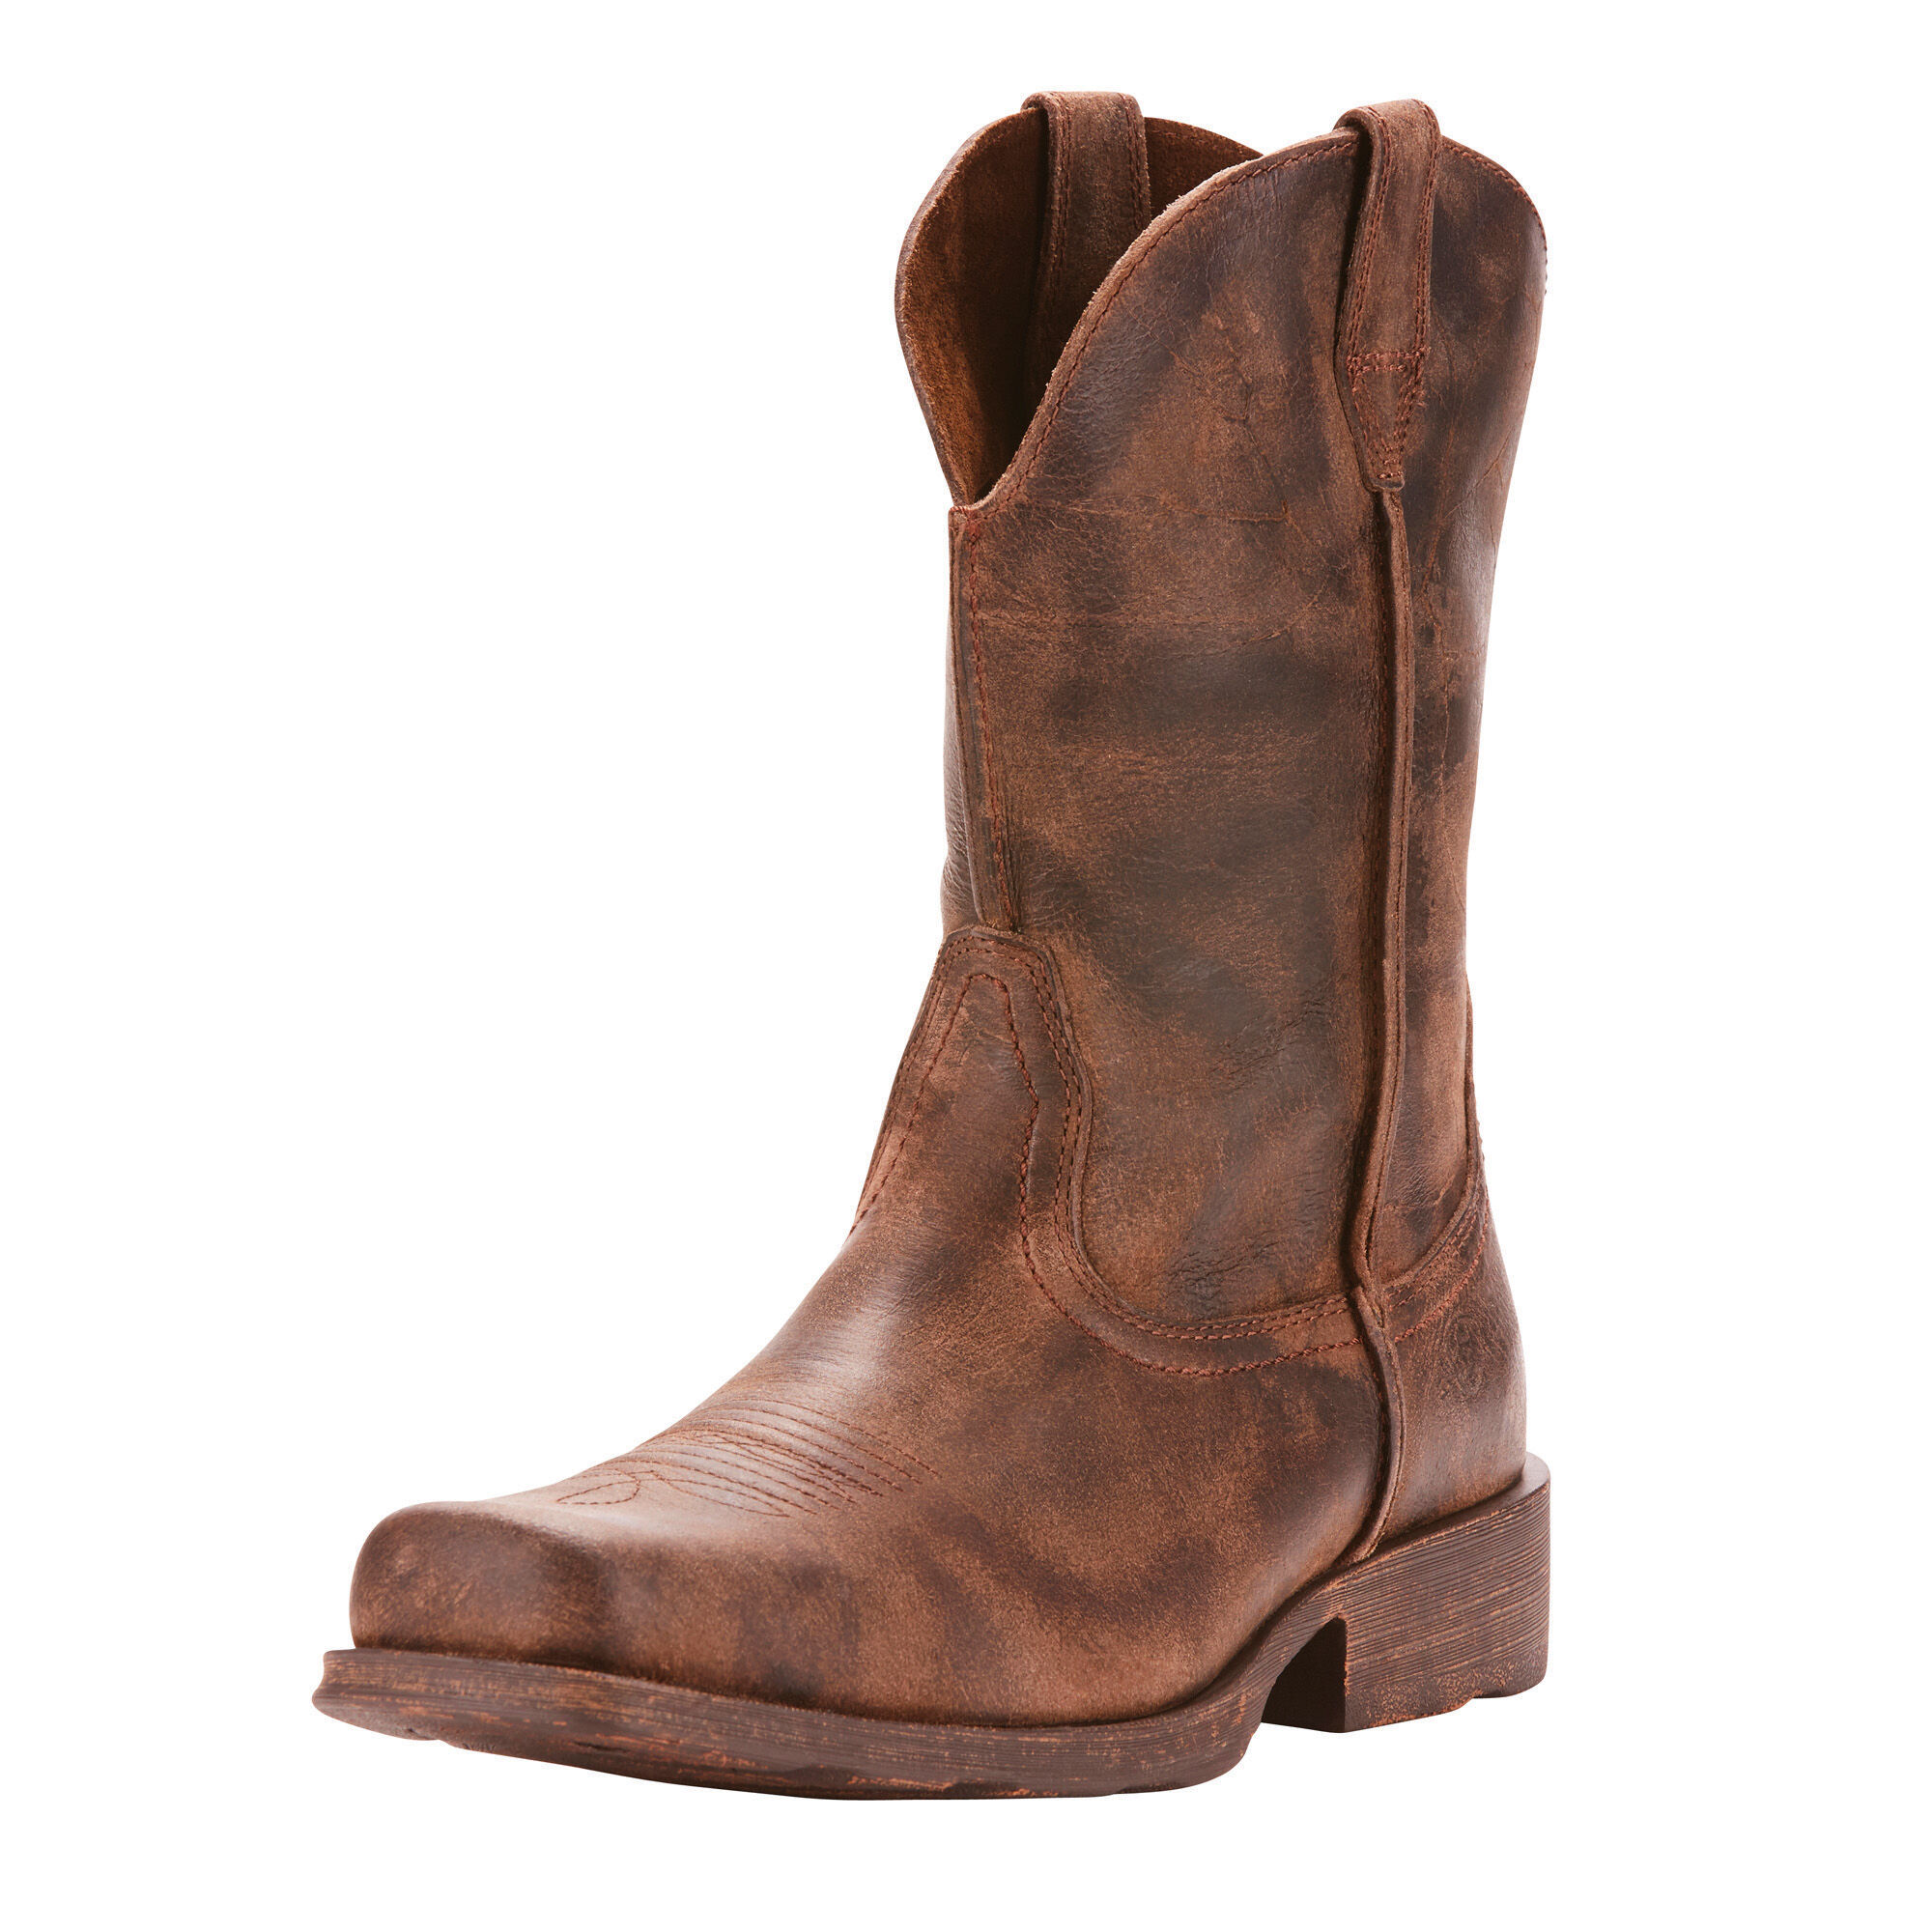 bc7f6220a13 Rambler Western Boot